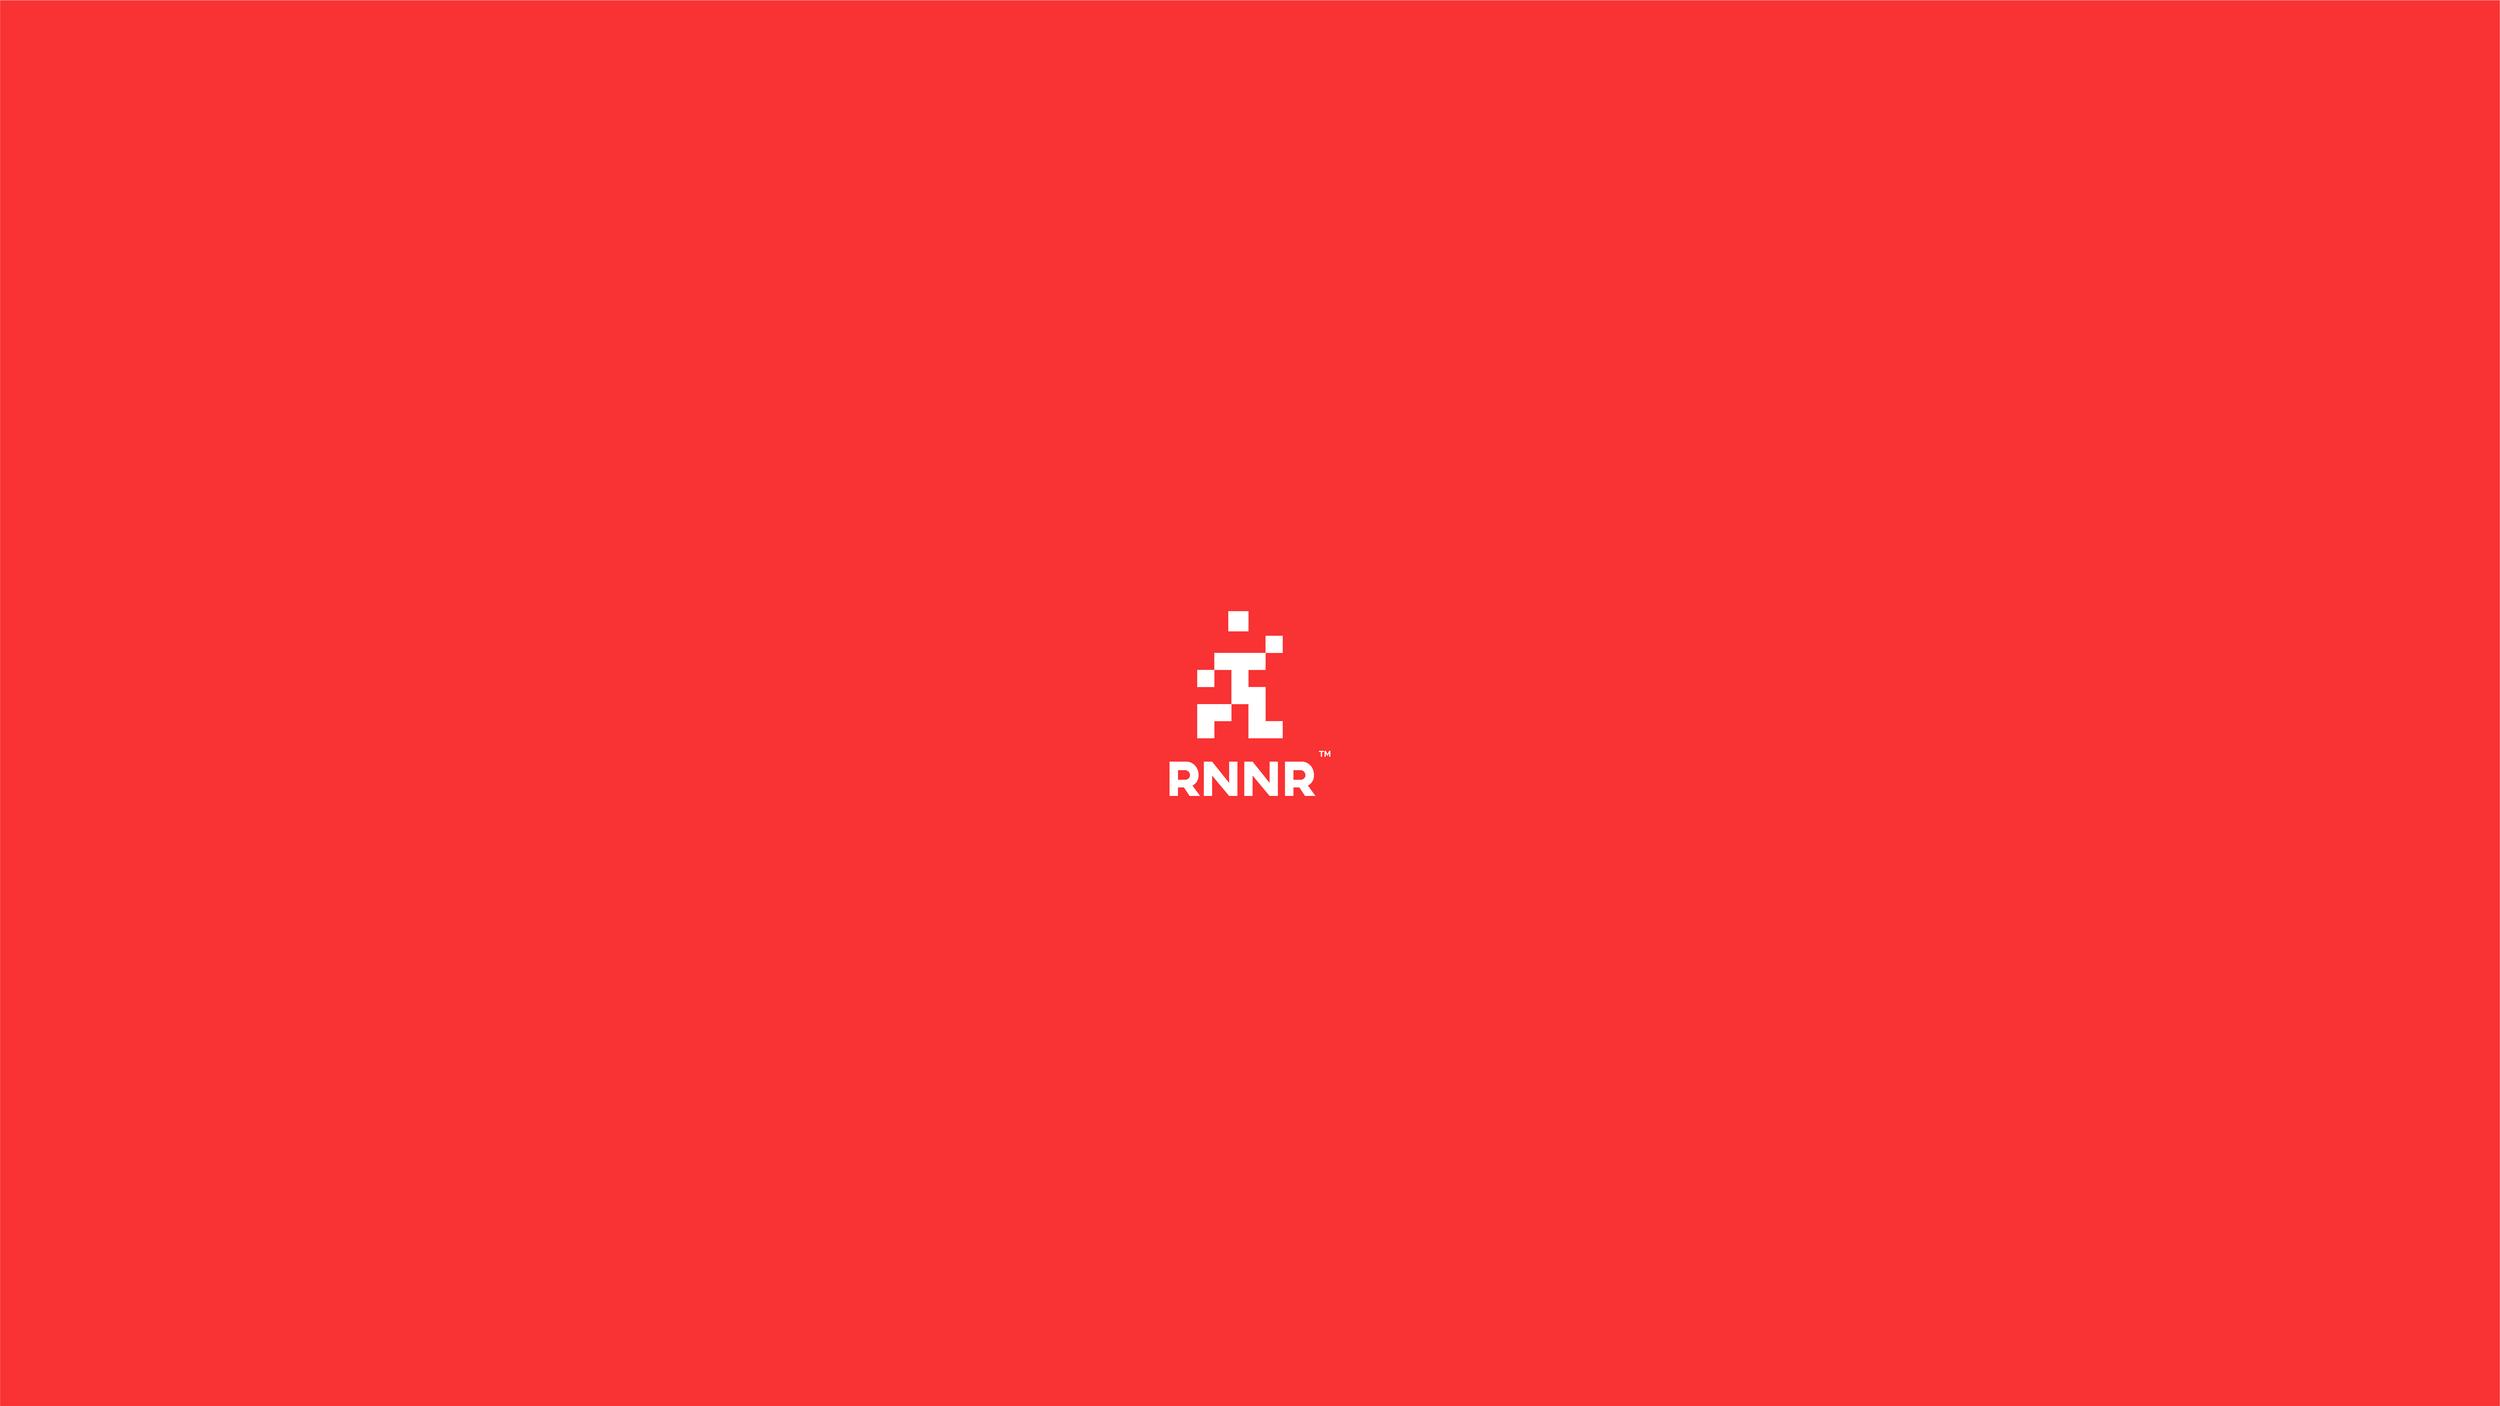 RNNR  Running-coach application's logo